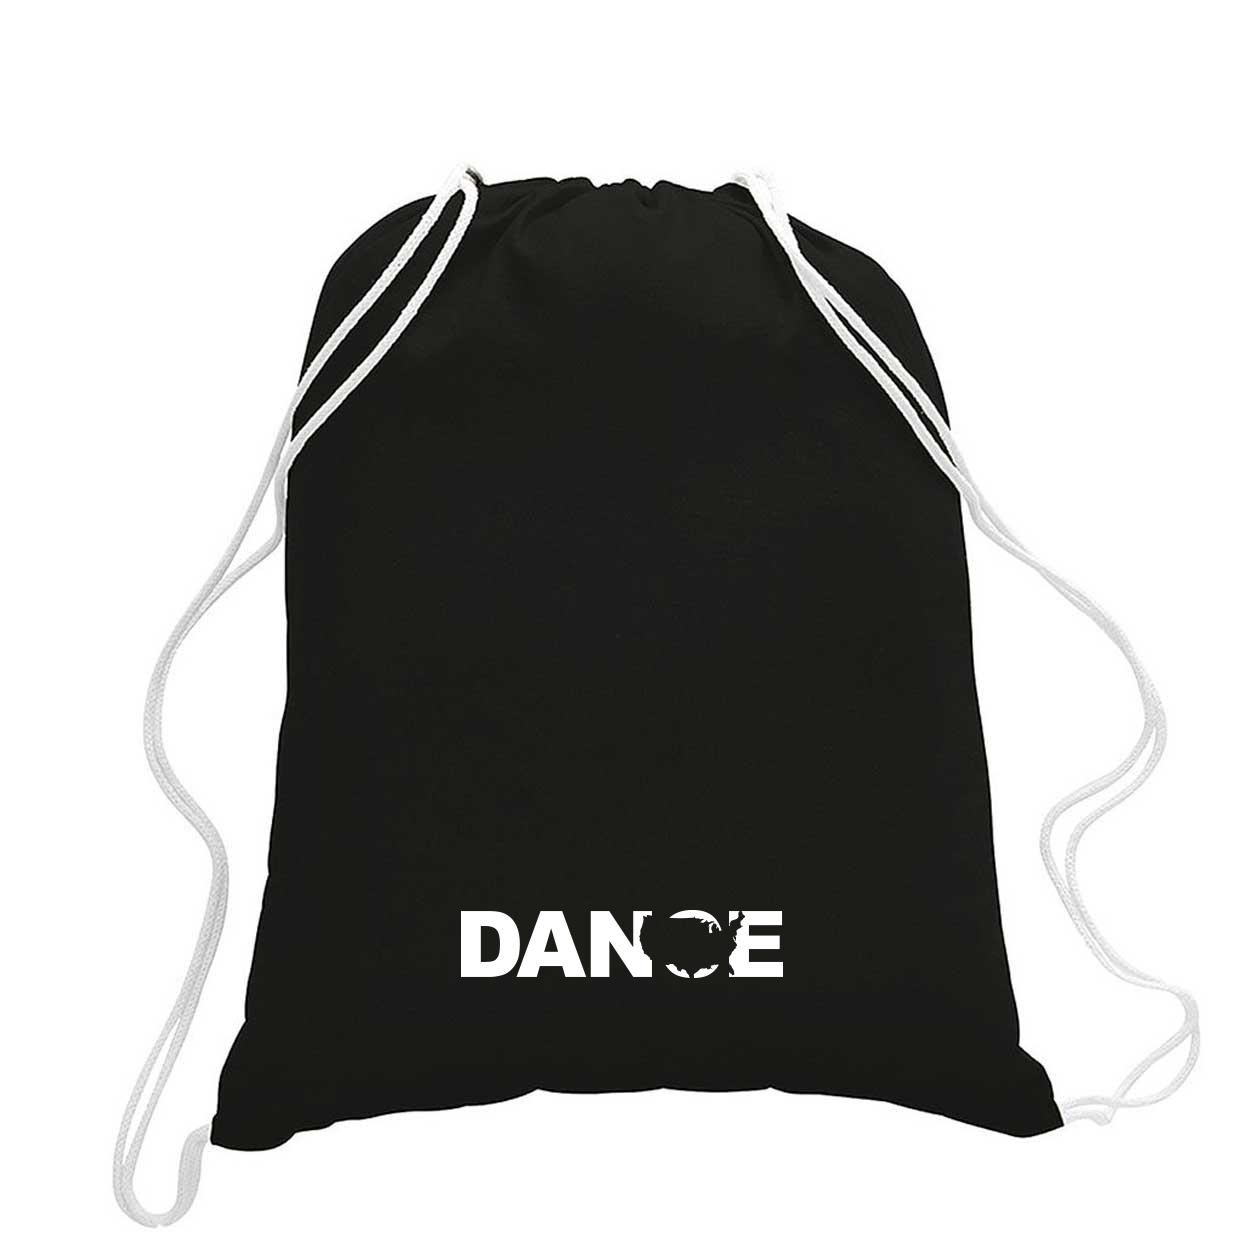 Dance United States Classic Drawstring Sport Pack Bag/Cinch Sack Black (White Logo)